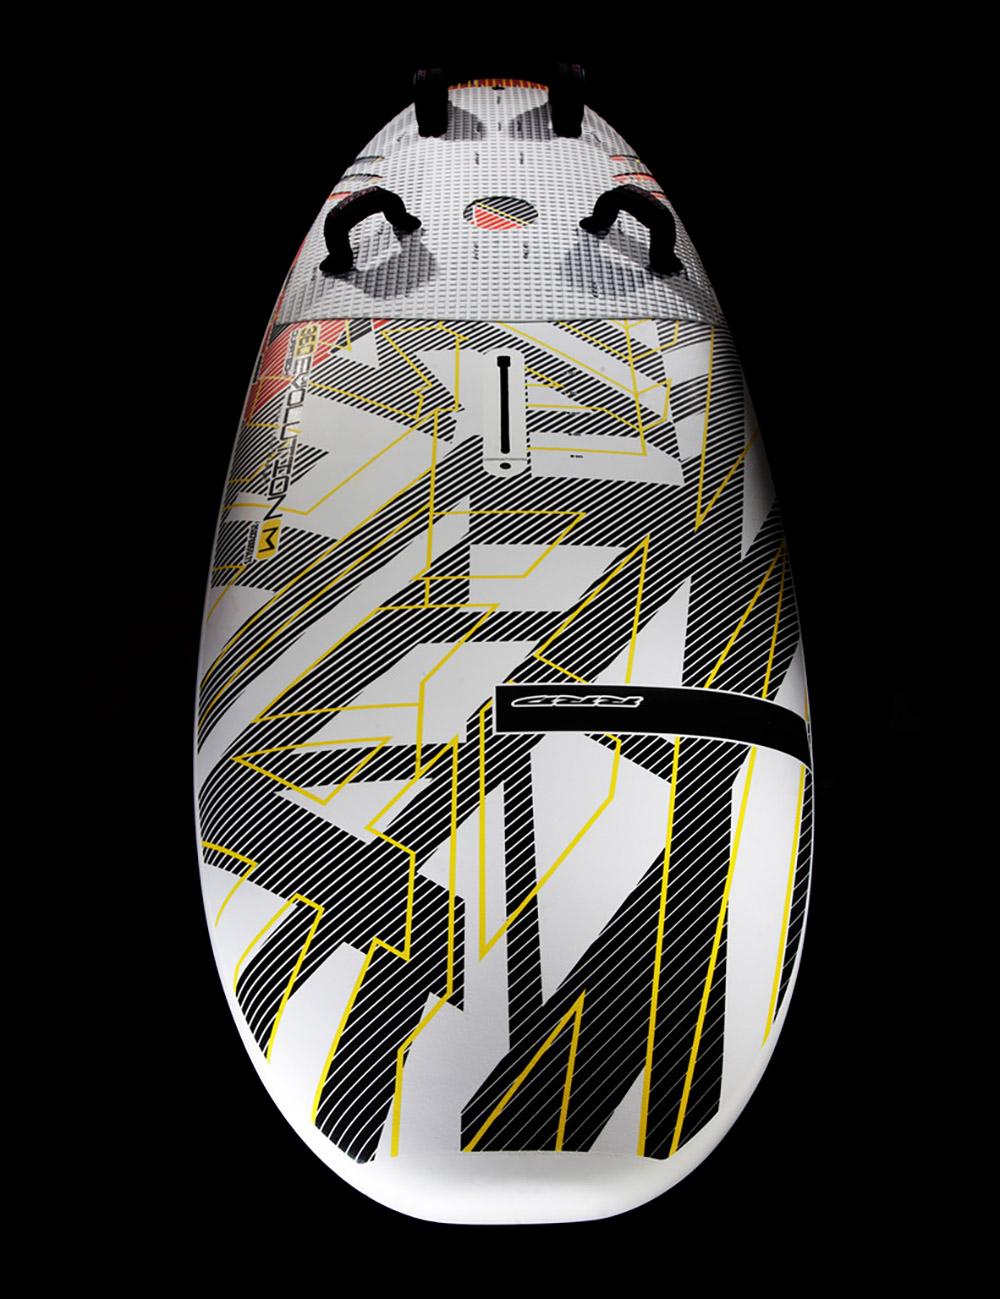 surfboard rrd 360 evolution